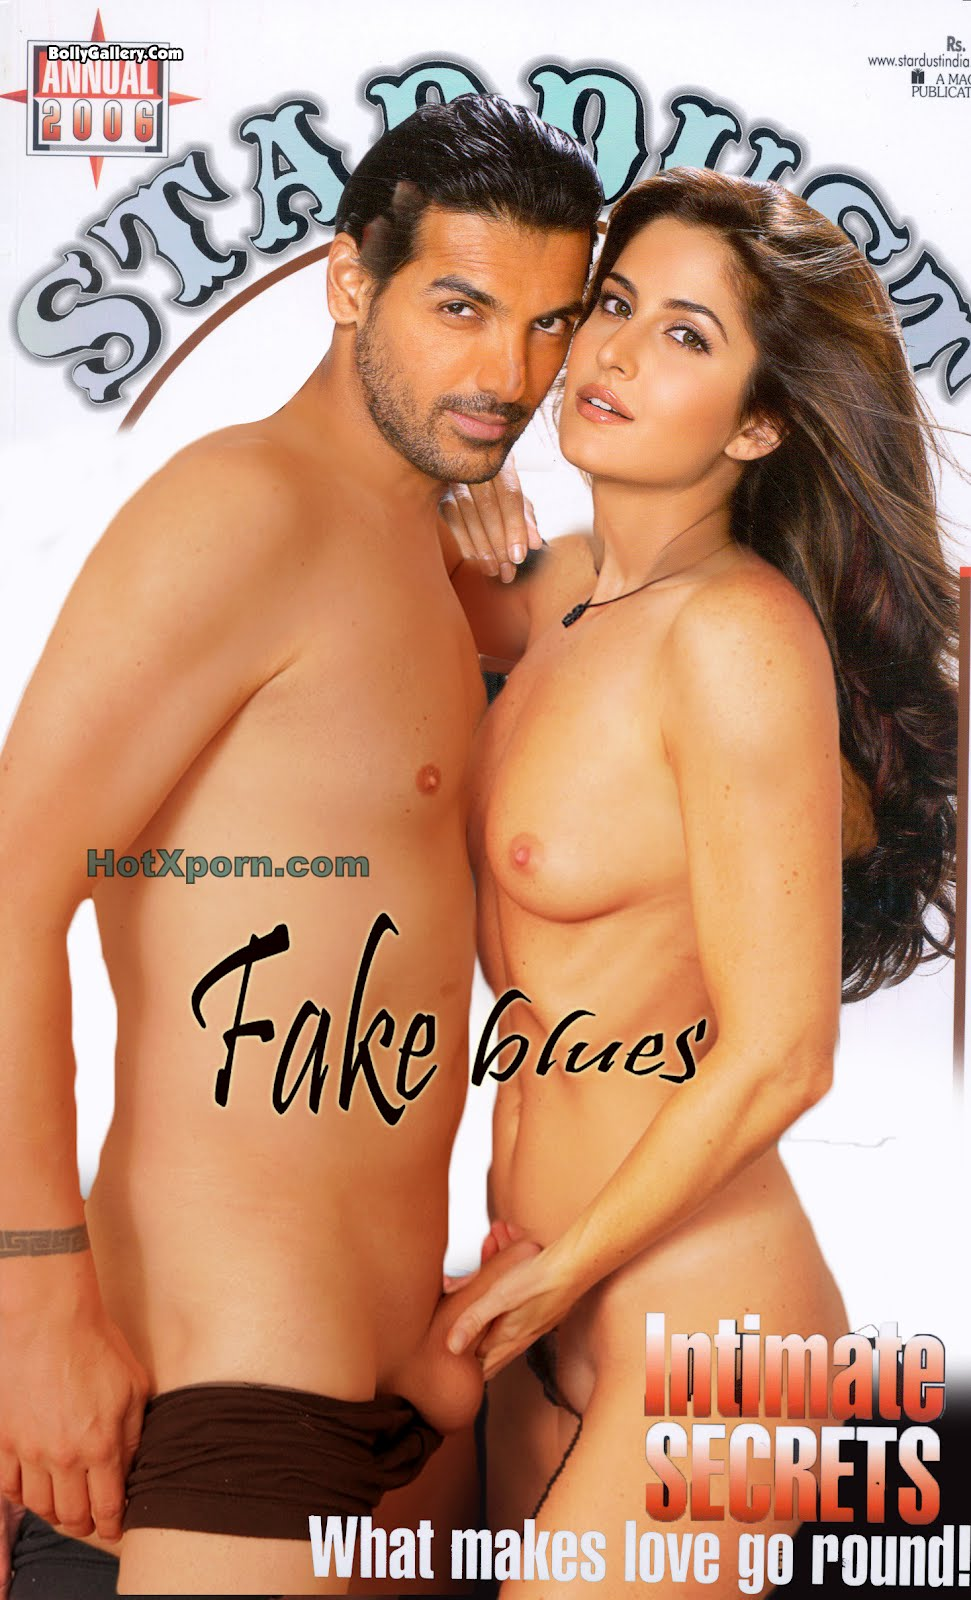 Naked Ugly Girls And Guys